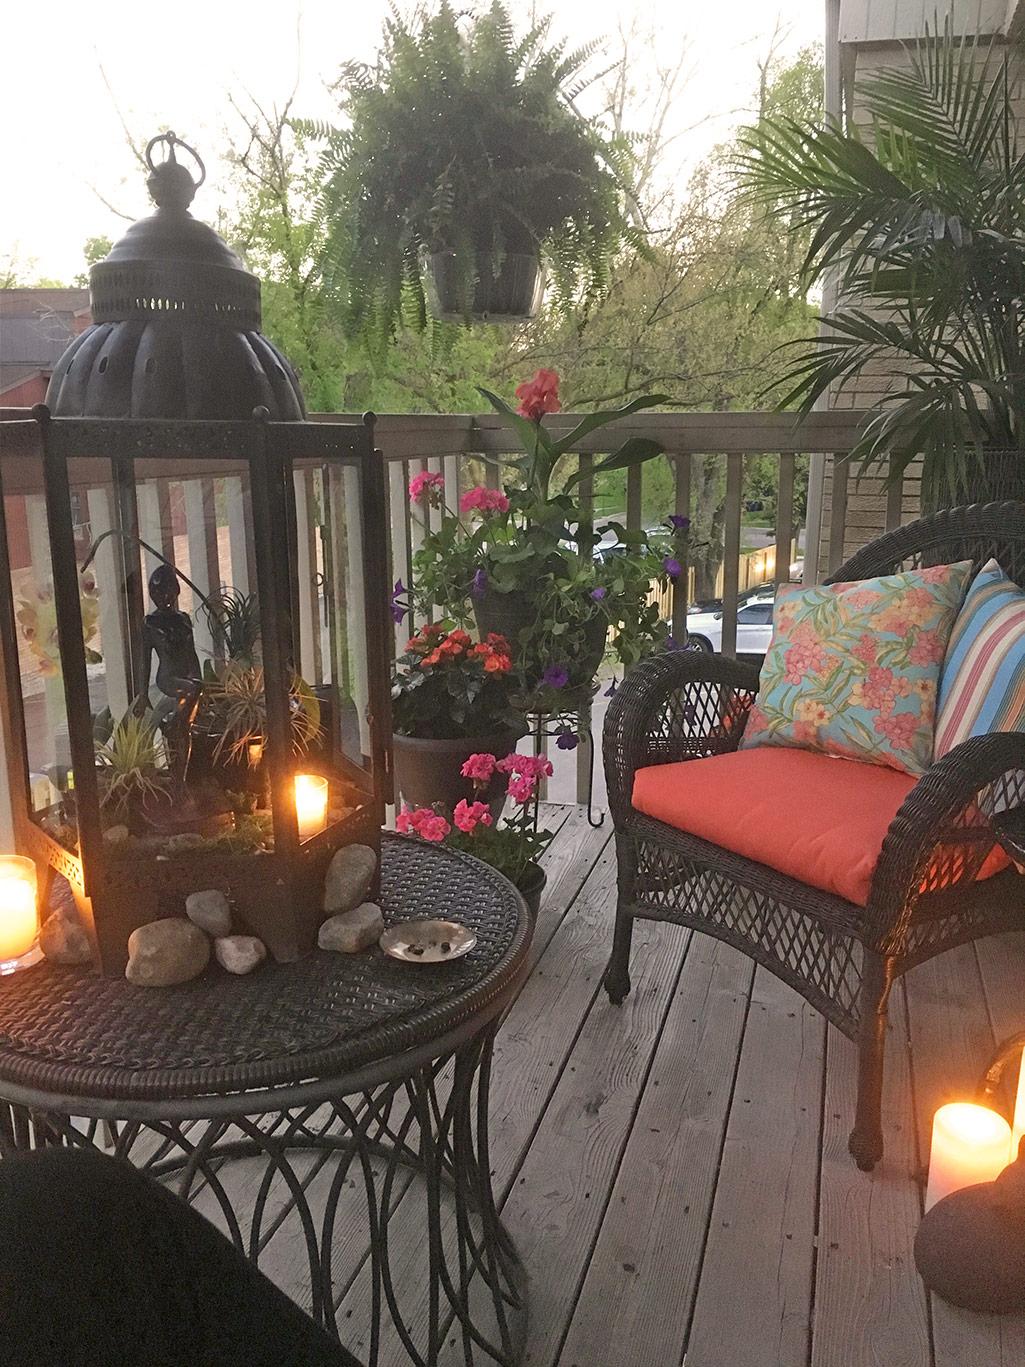 wendy-ryan-interiors-ann-arbor-patio-01.jpg